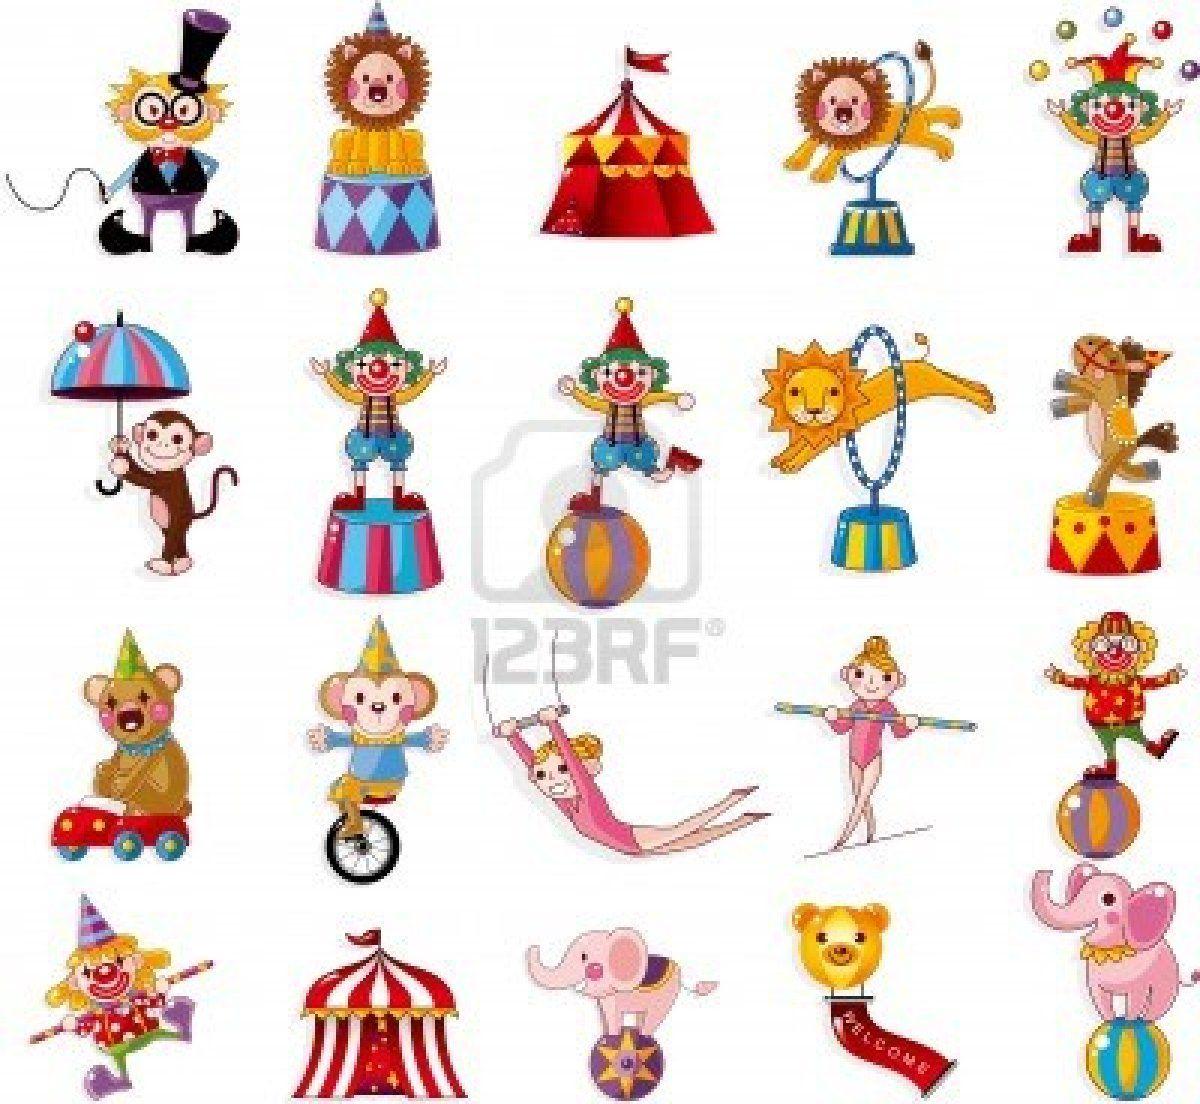 15+ Free Cartoon Circus Animals Clipart